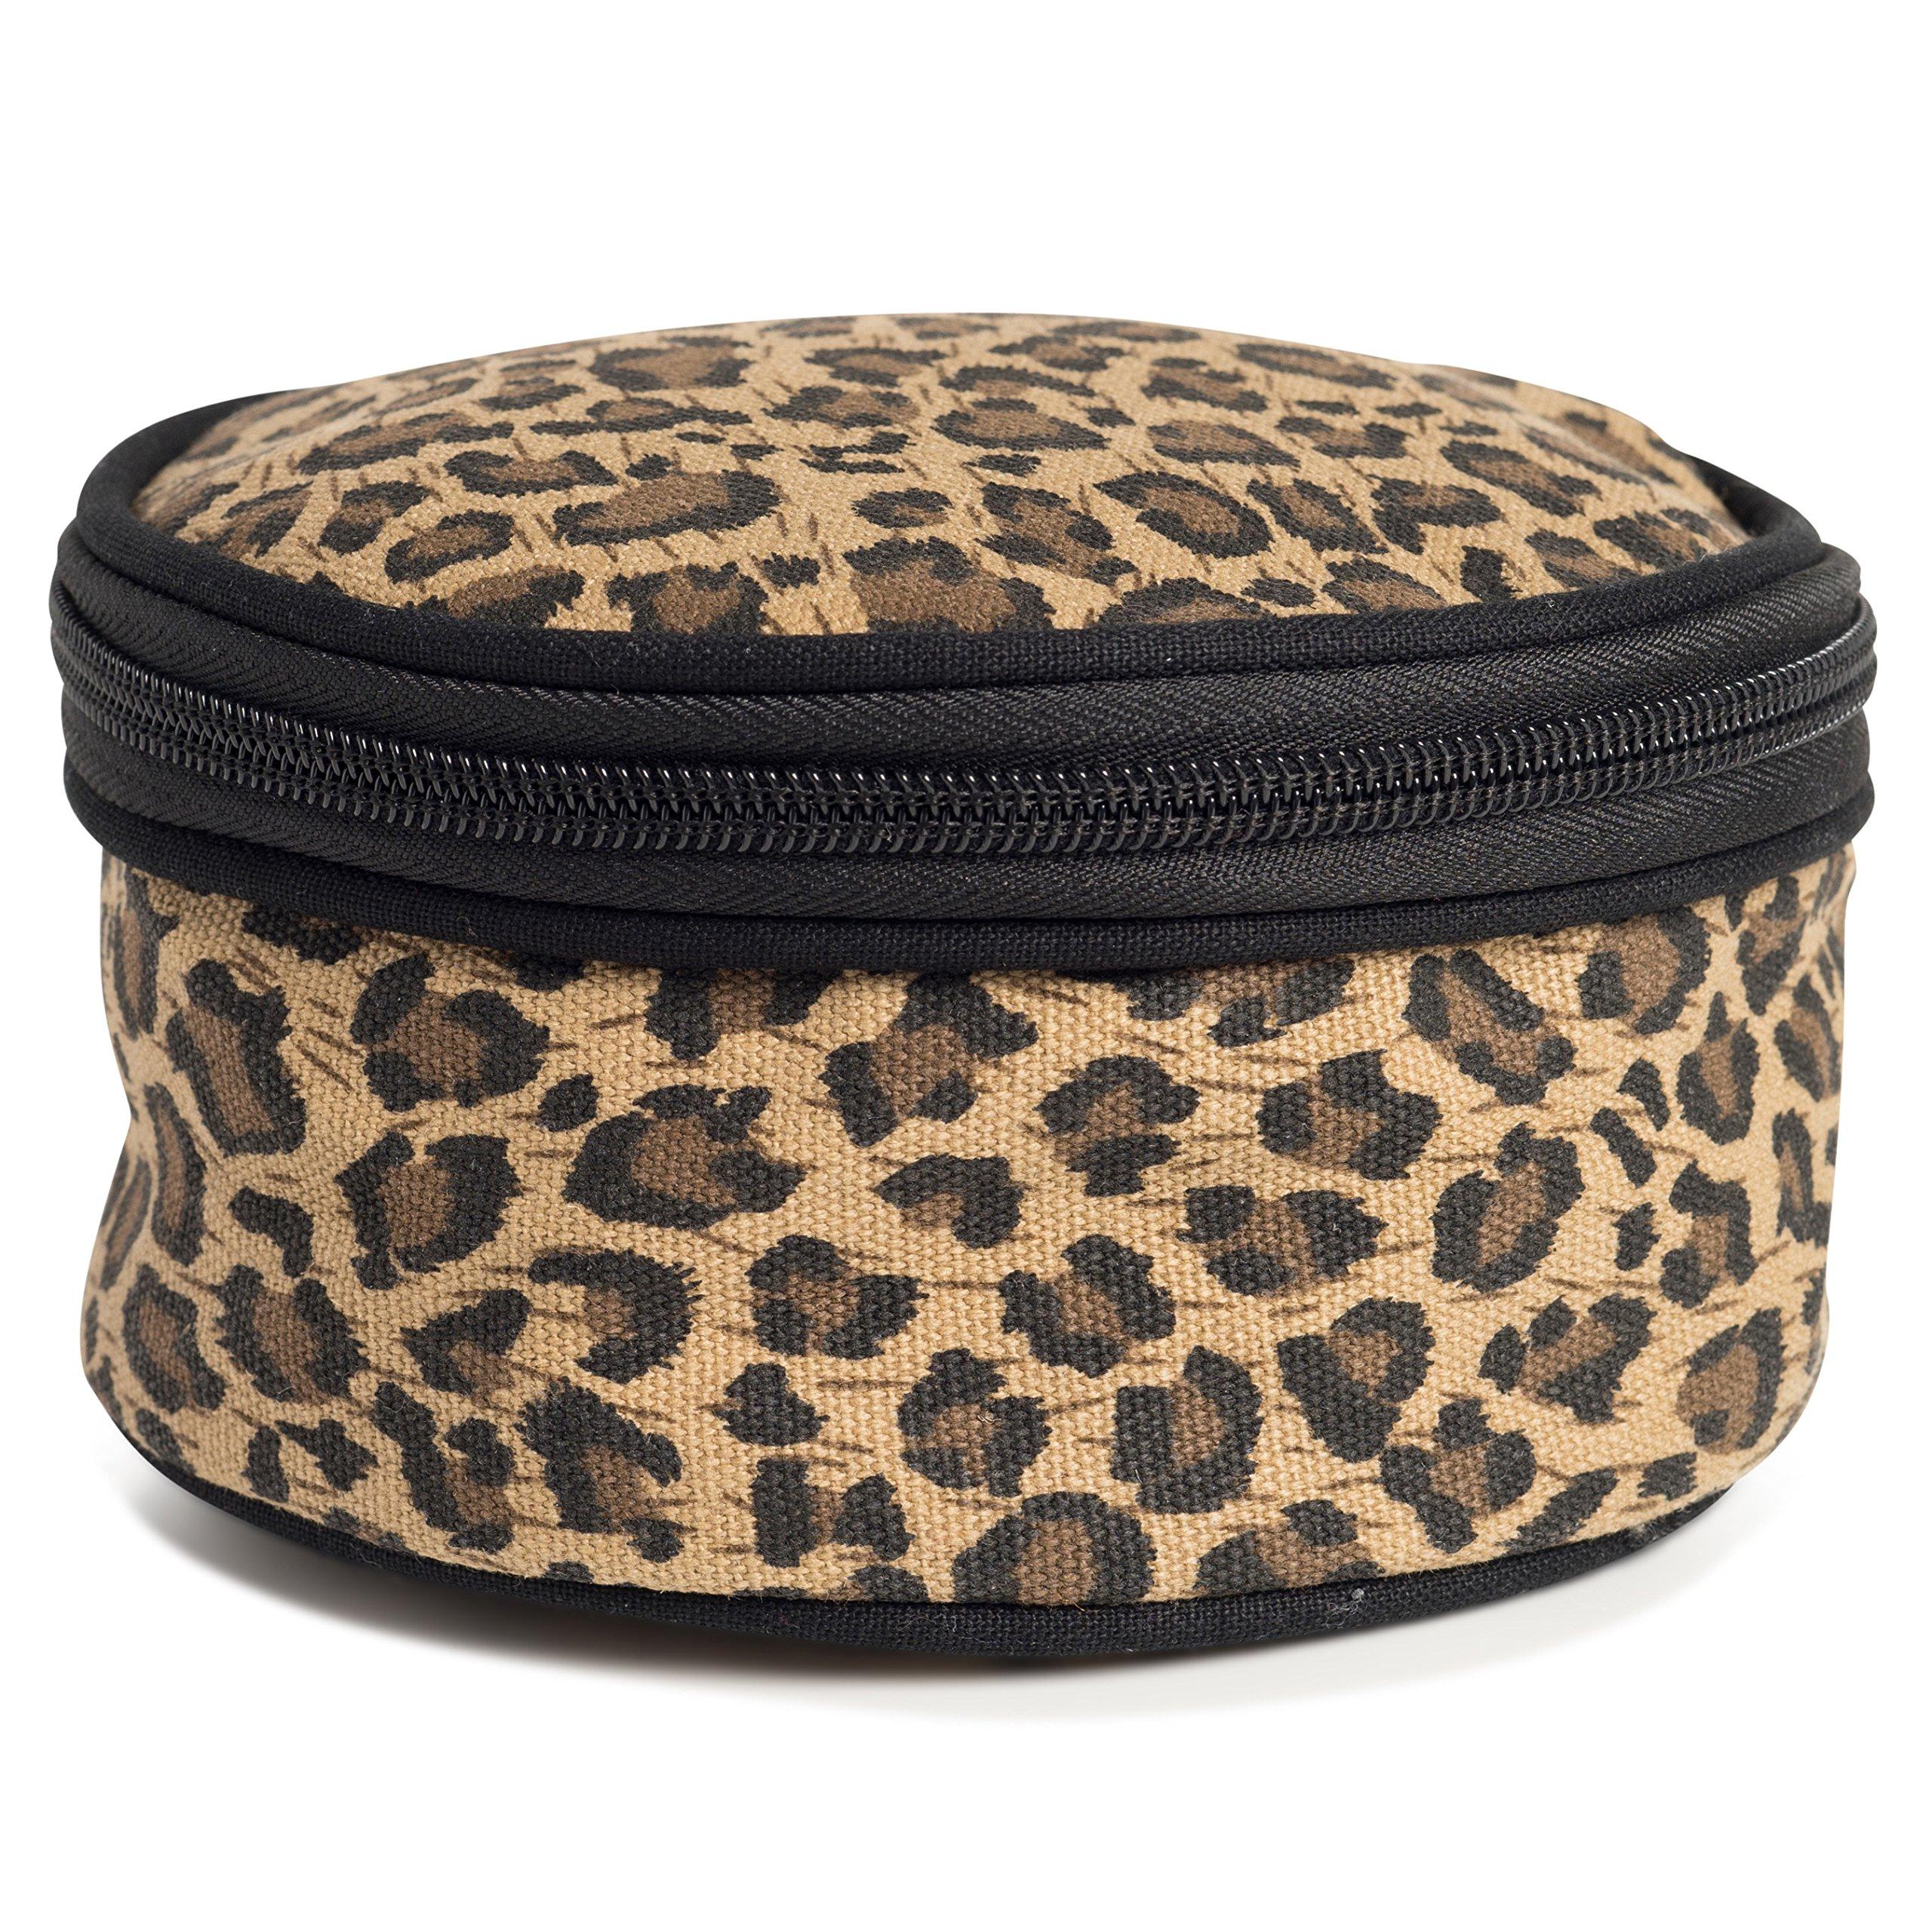 Round Travel Jewelry Case (Leopard)